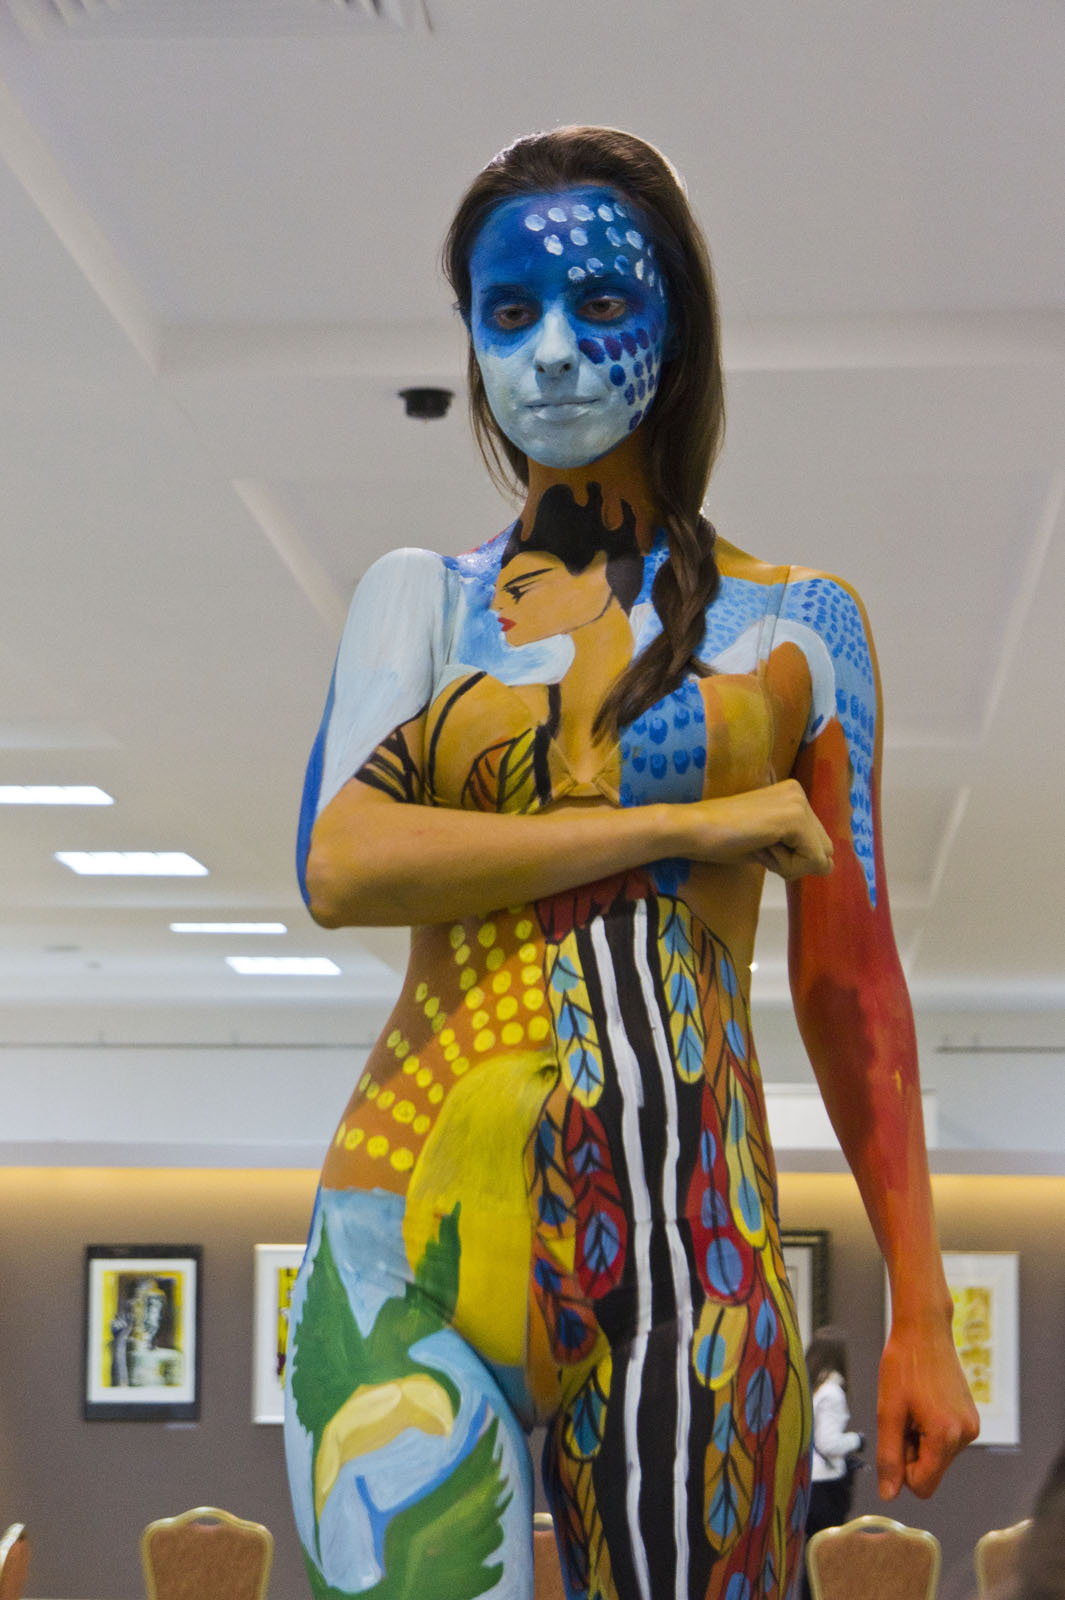 Фото №78144. Второе место в конкурсе «Body-Art Battle» в Манеже